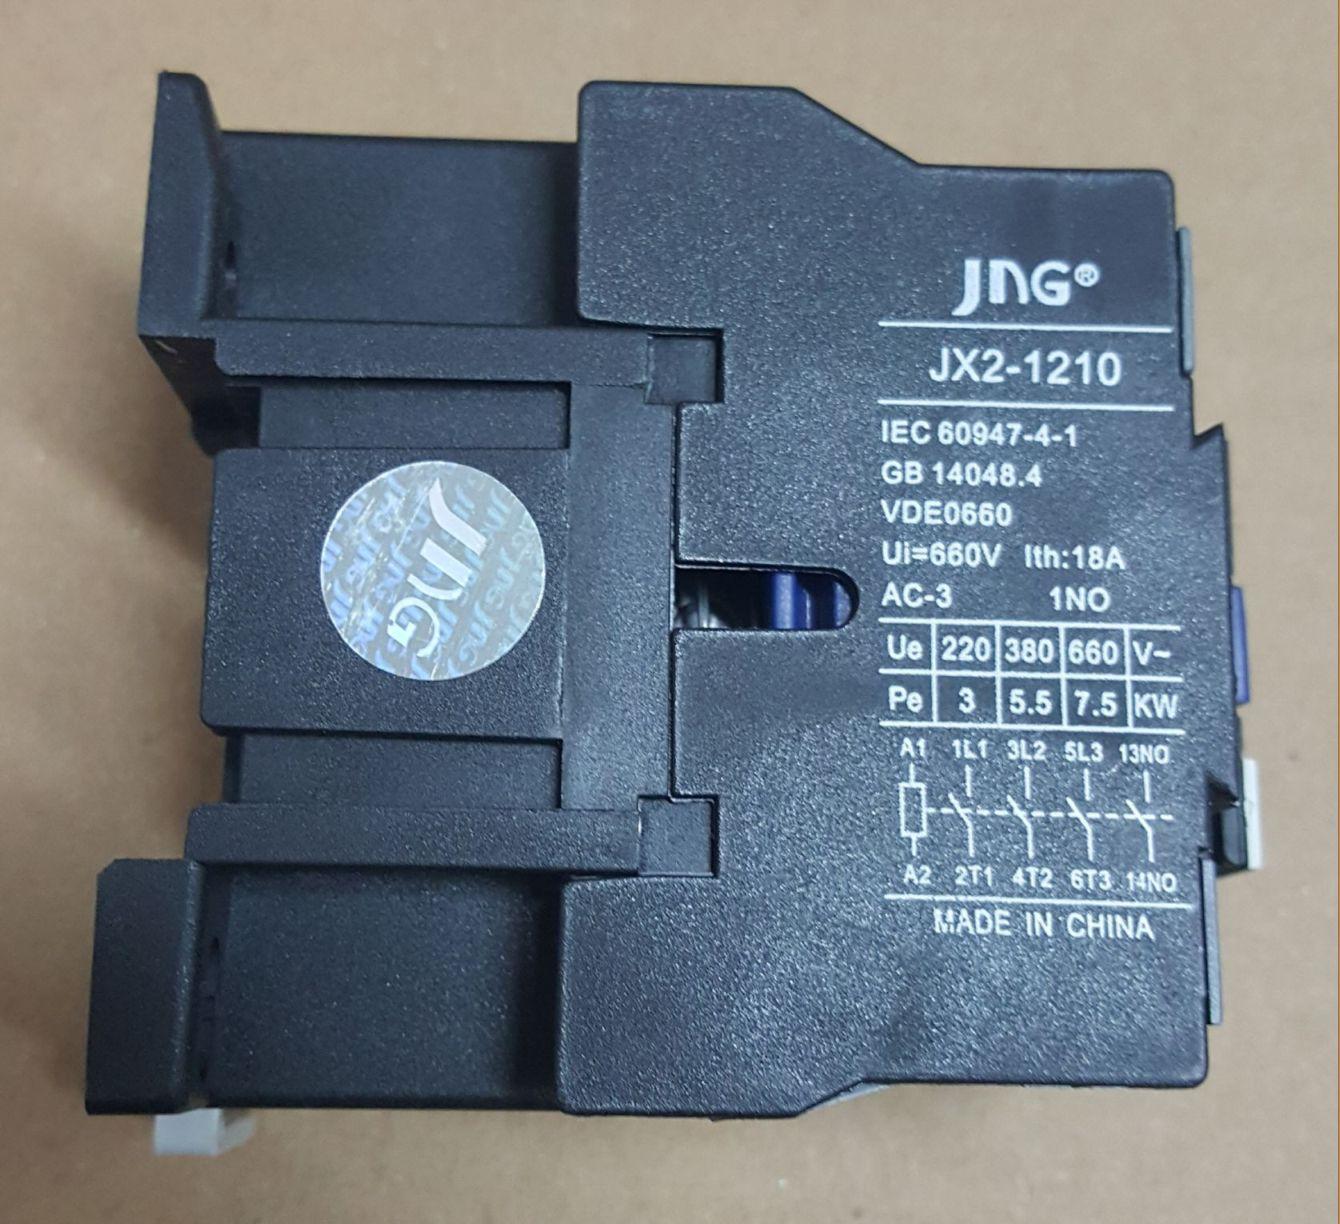 CONTATOR AUXILIAR JX2-1210 (12 AMPERES) 380V FAIXA AJUSTE 18A